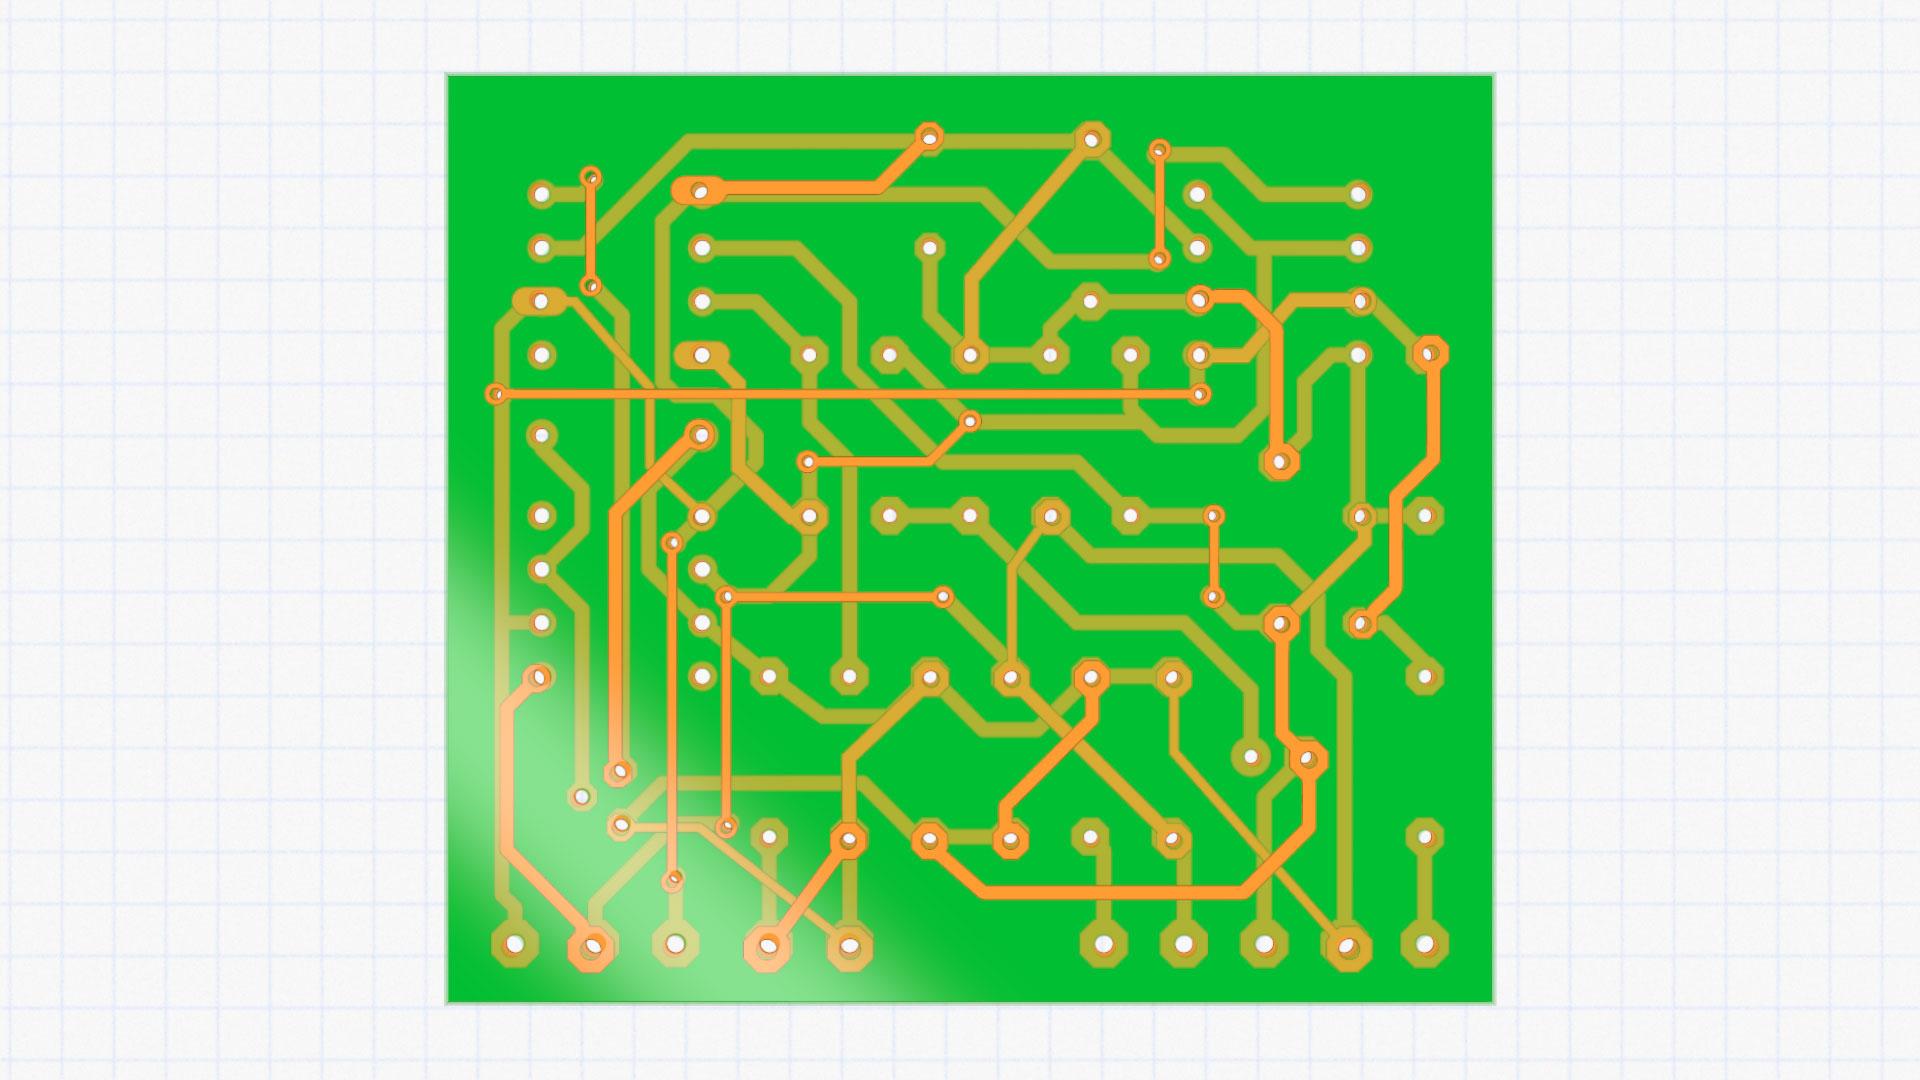 circuit_playground_series_still10.jpg